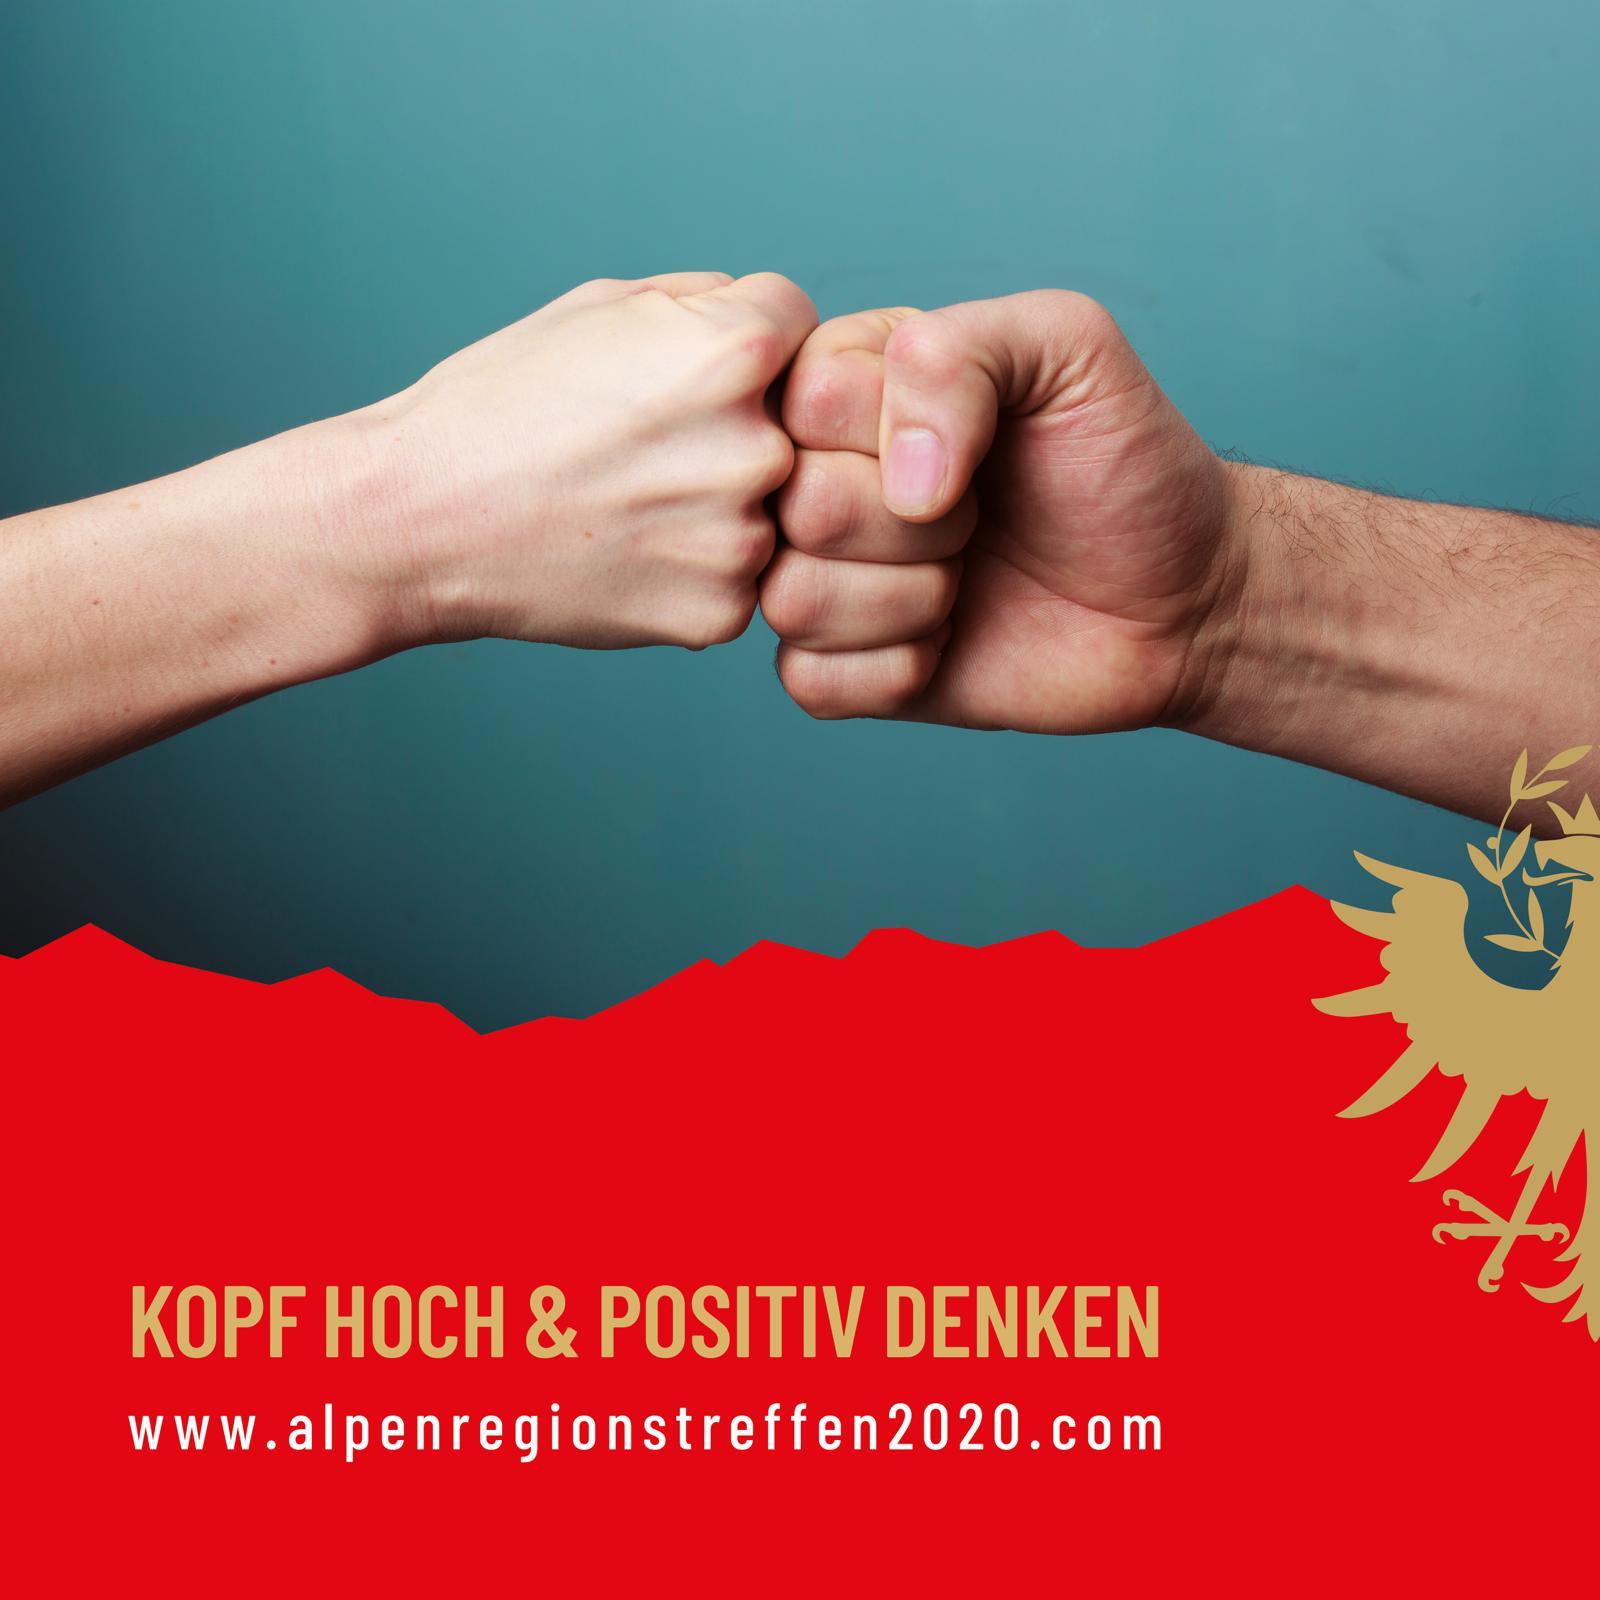 26. Alpenregionstreffen 2020 – 𝗣𝗢𝗦𝗜𝗧𝗜𝗩 𝗗𝗘𝗡𝗞𝗘𝗡!